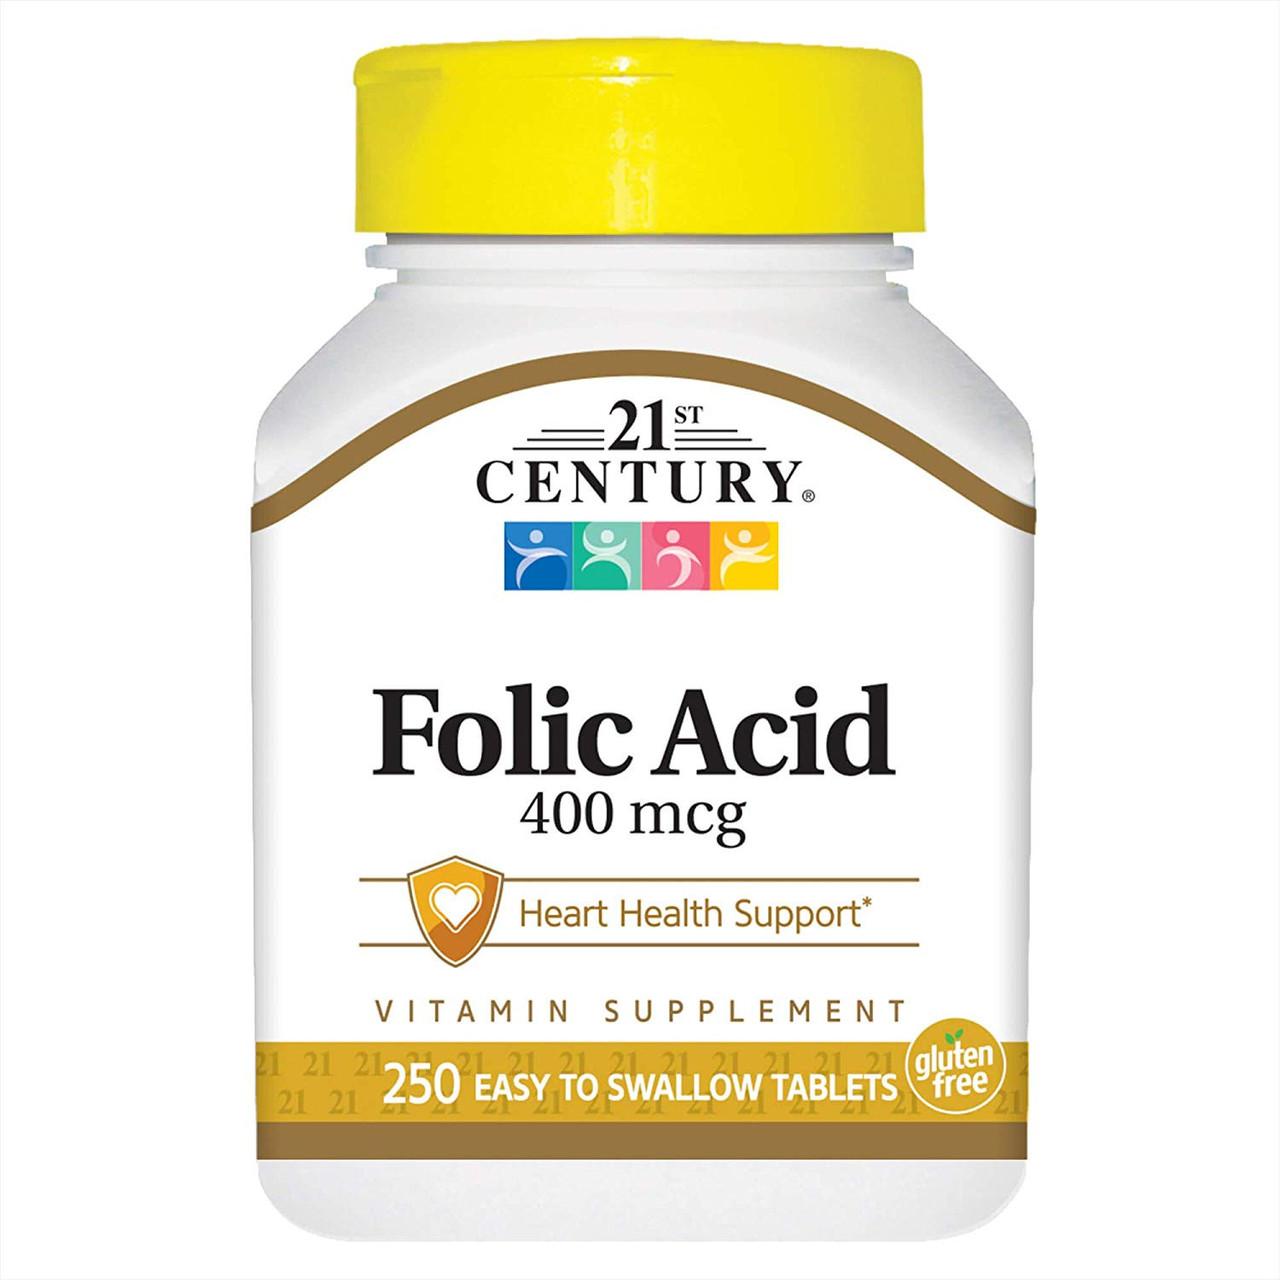 Фолиевая кислота 21st Century Folic Acid (250 табл) 21 век центури